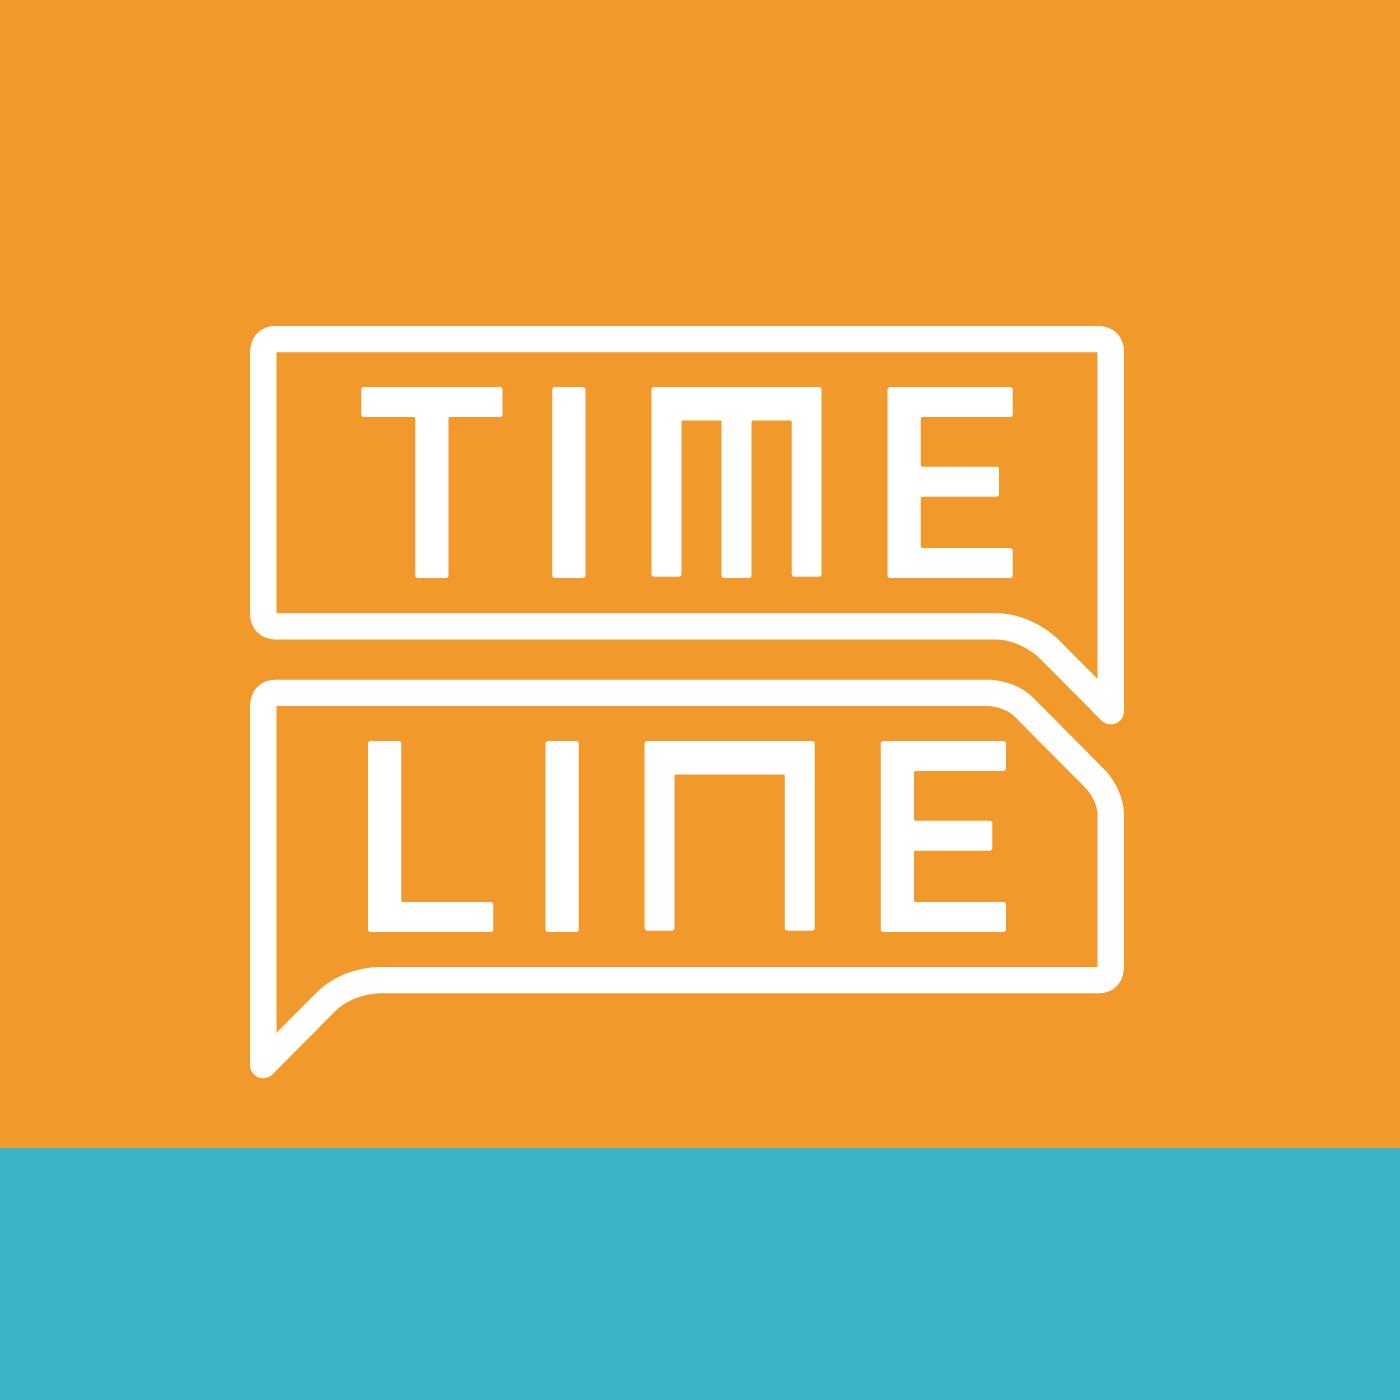 Timeline Gaúcha 19/10/2017